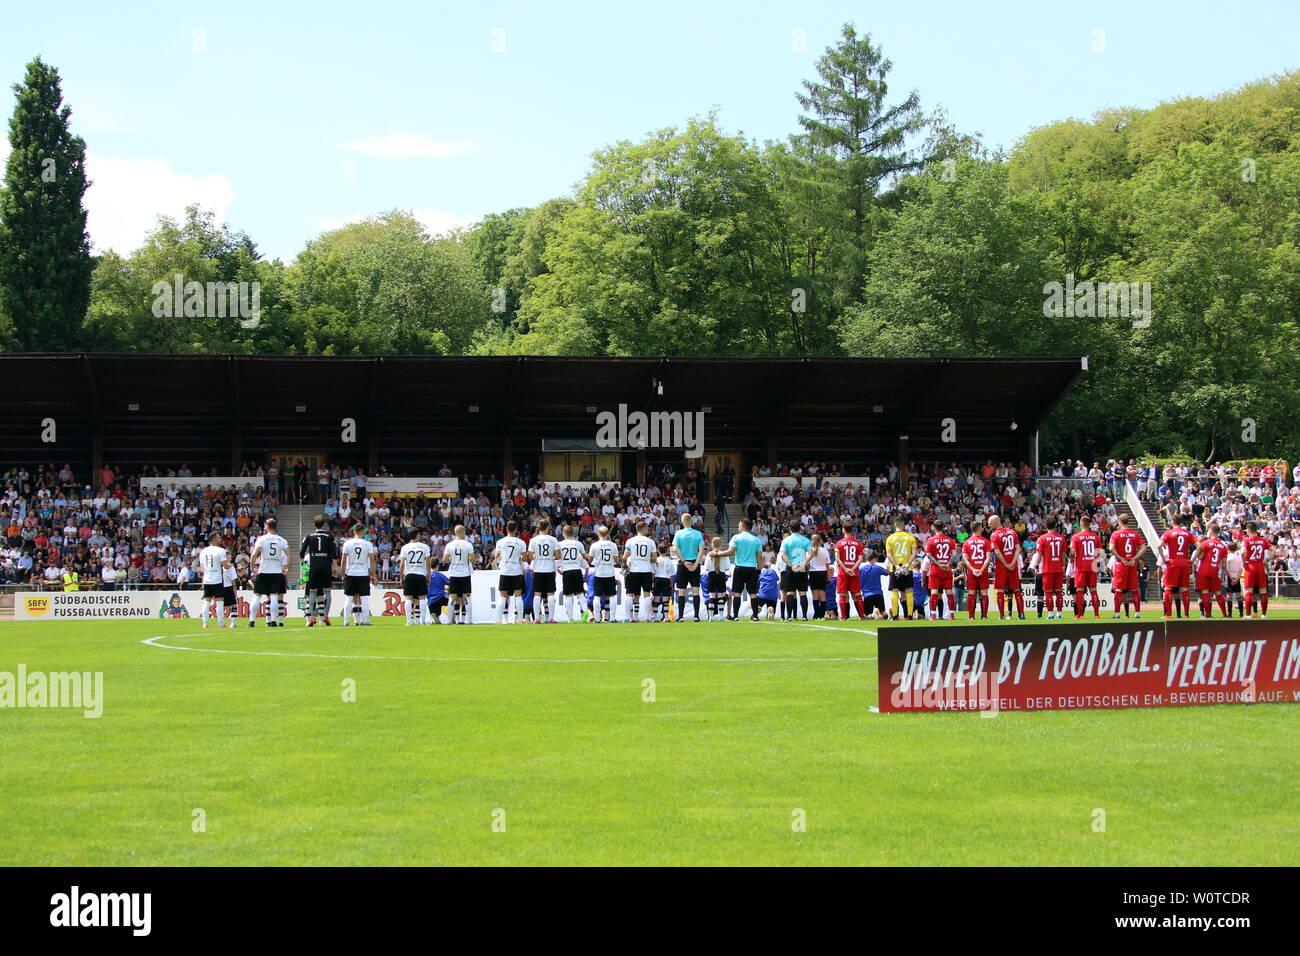 Die Mannschaften vor dem Anpfiff vor der Haupttribuene,   SBFV-Pokal Finale 2017/18: FC 08 Villingen - SV Linx - Stock Image